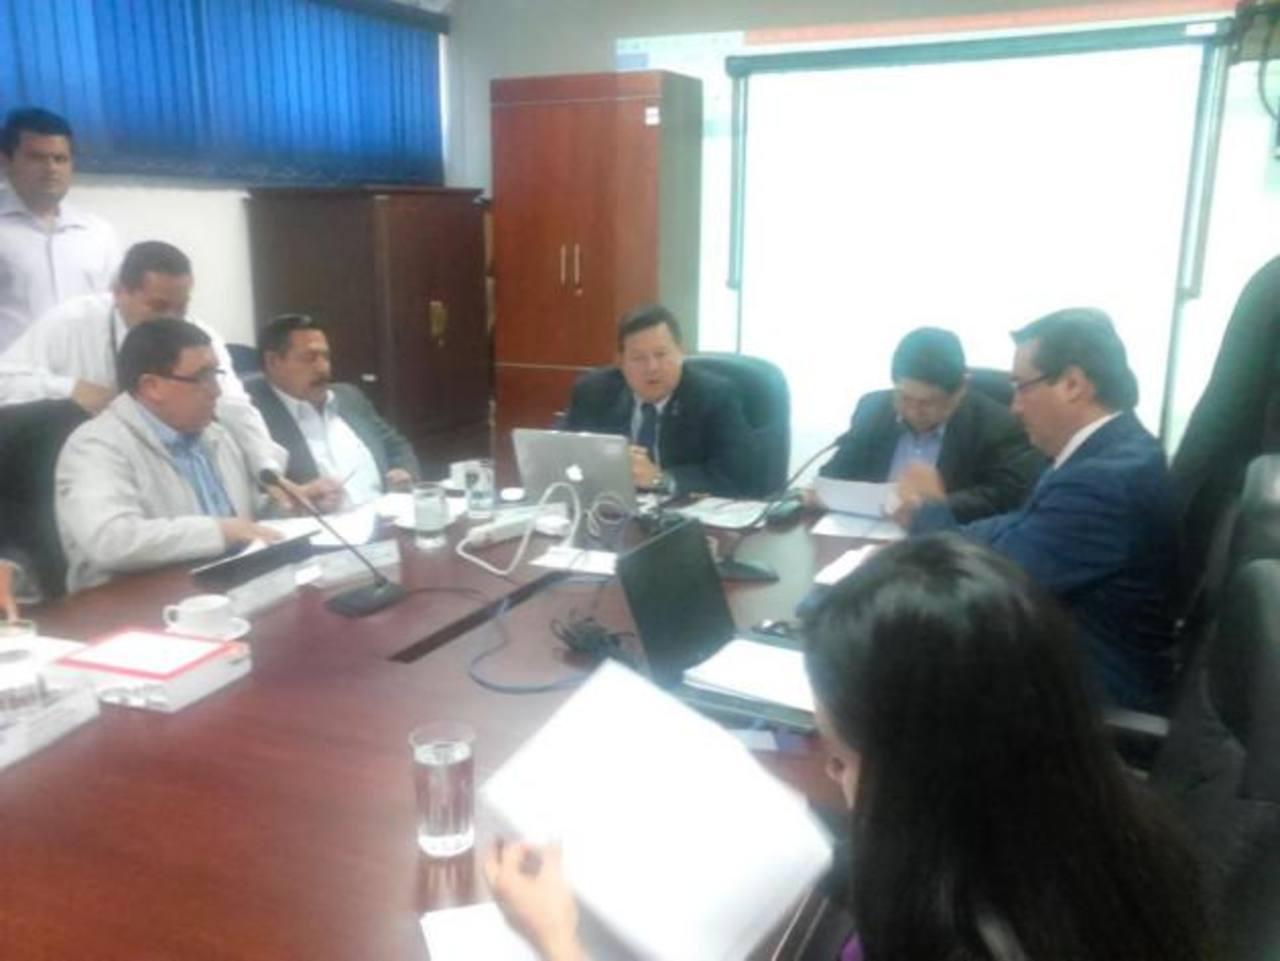 Fiscalía investiga extorsión de $50 Mlls. a escala internacional